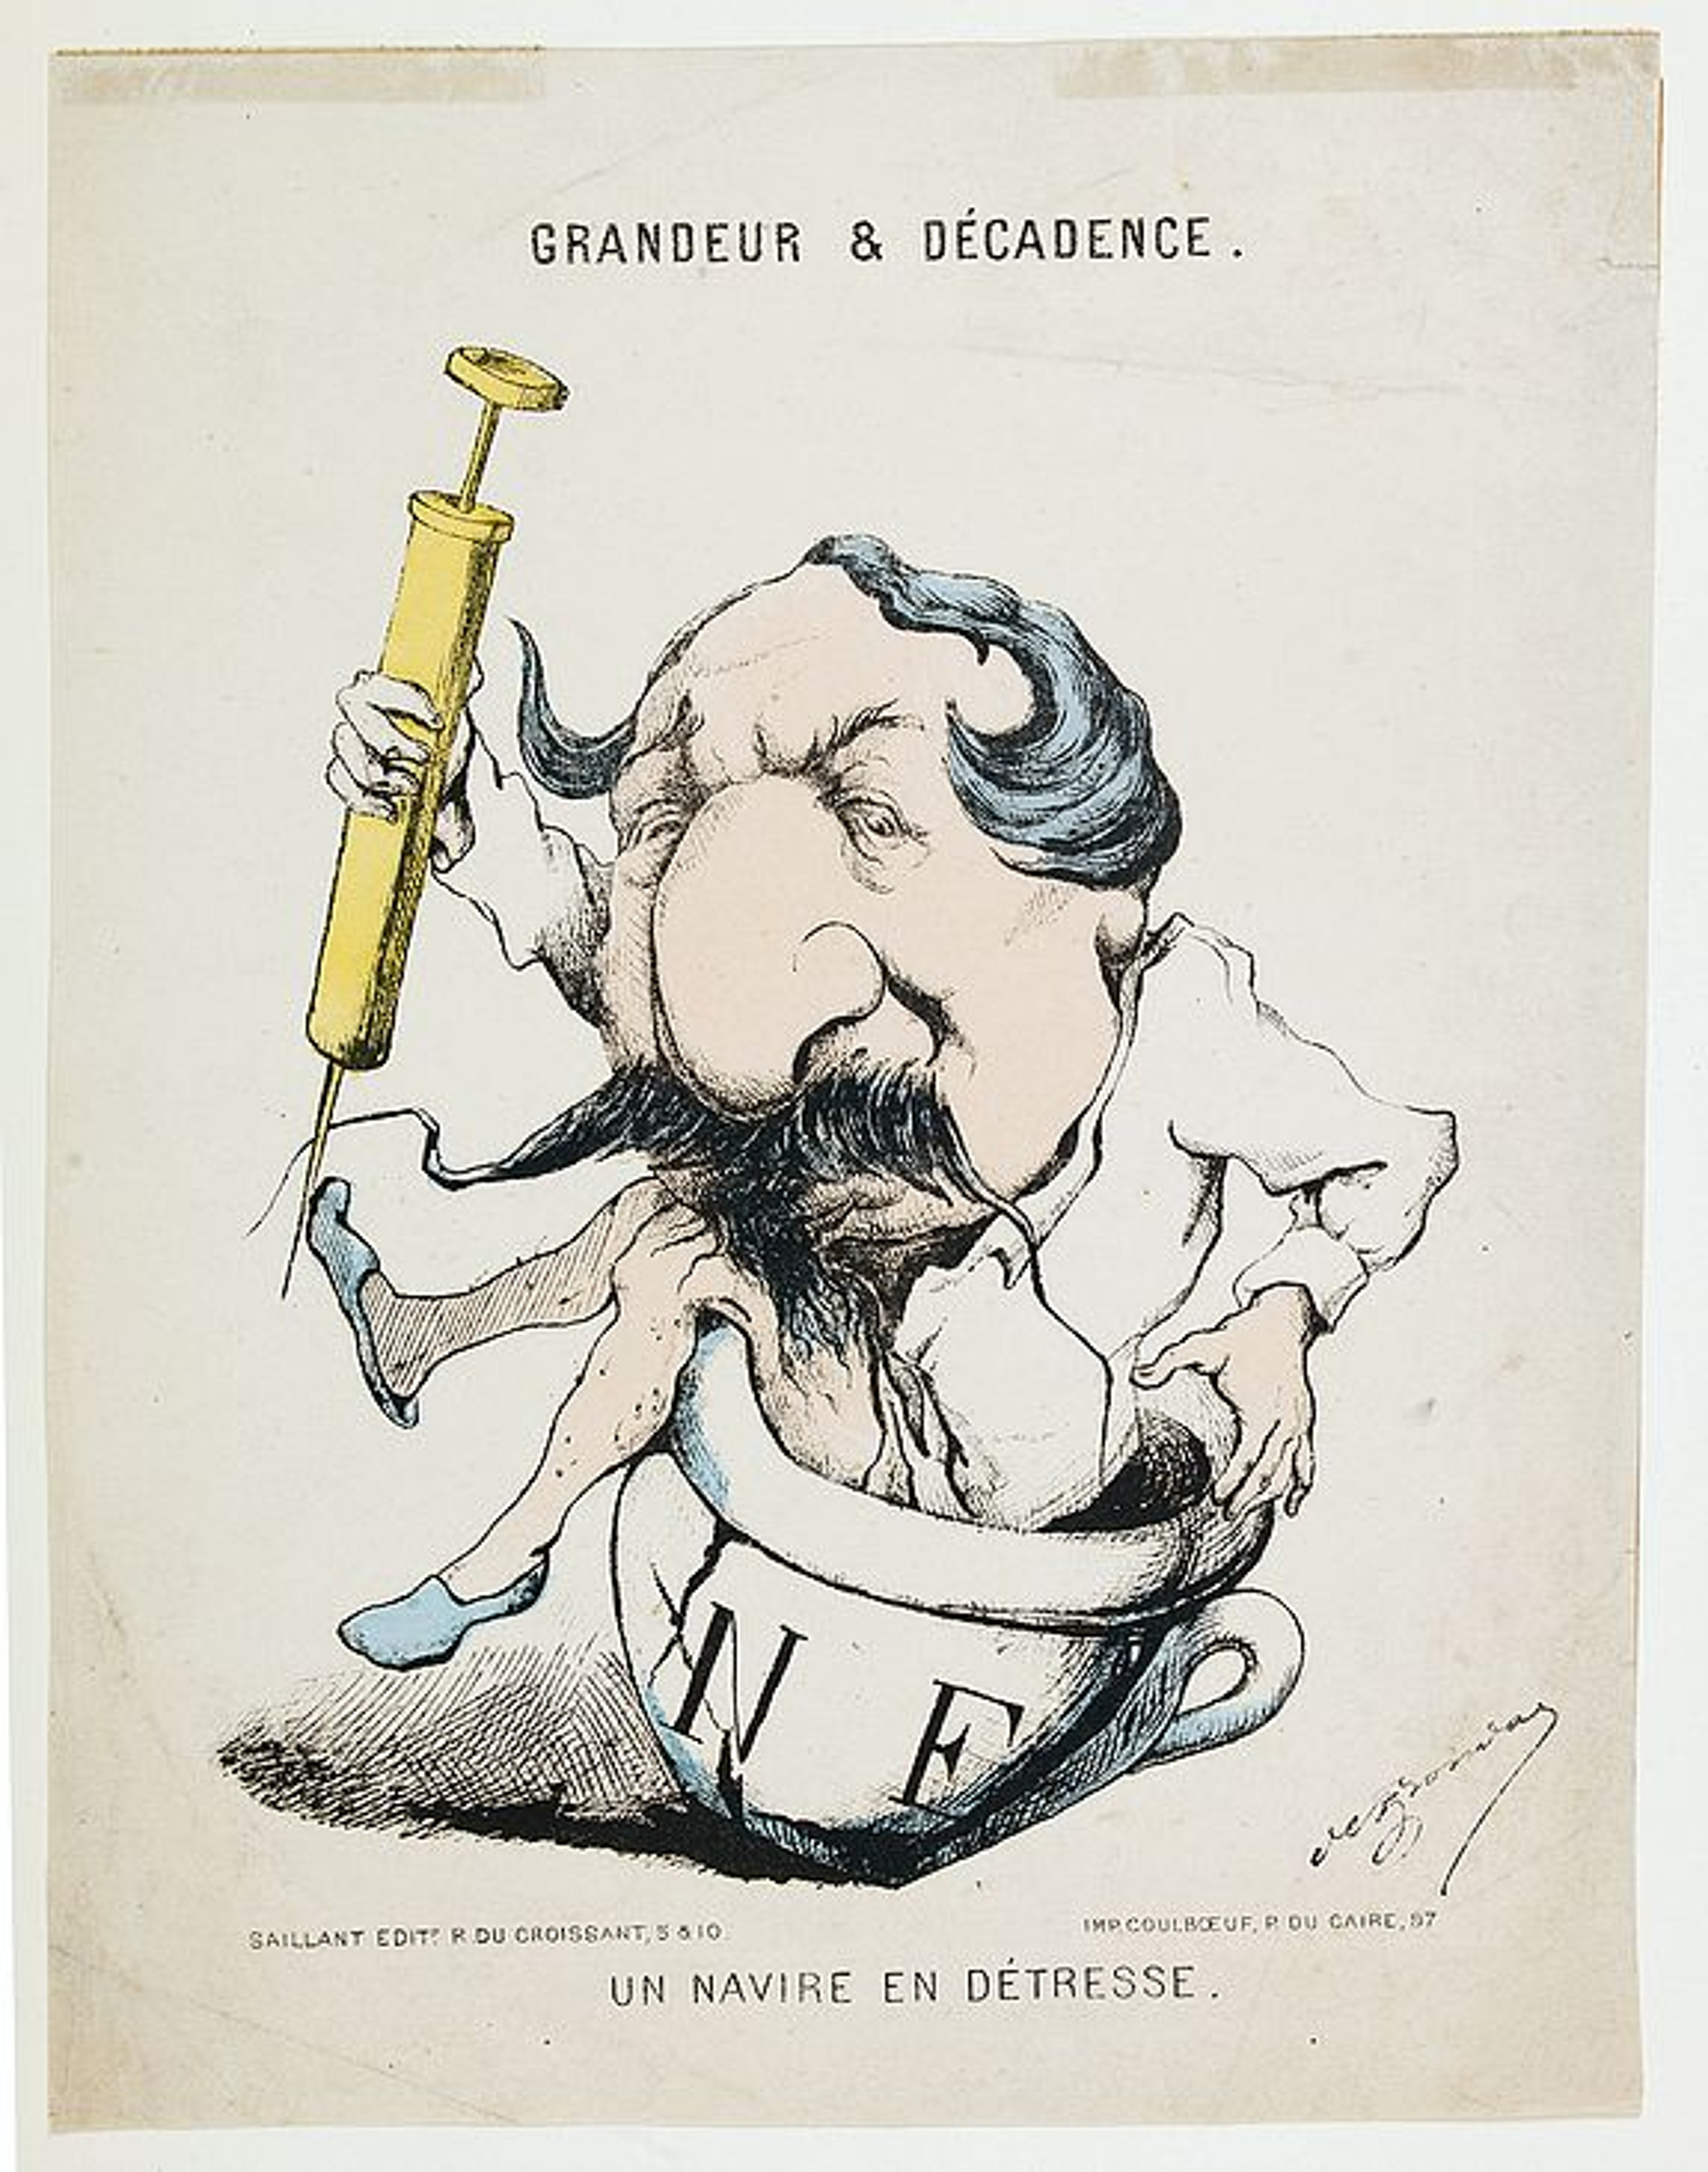 FRONDAT, Charles de. -  Grandeur et Decadence. Un Navire en Detresse.